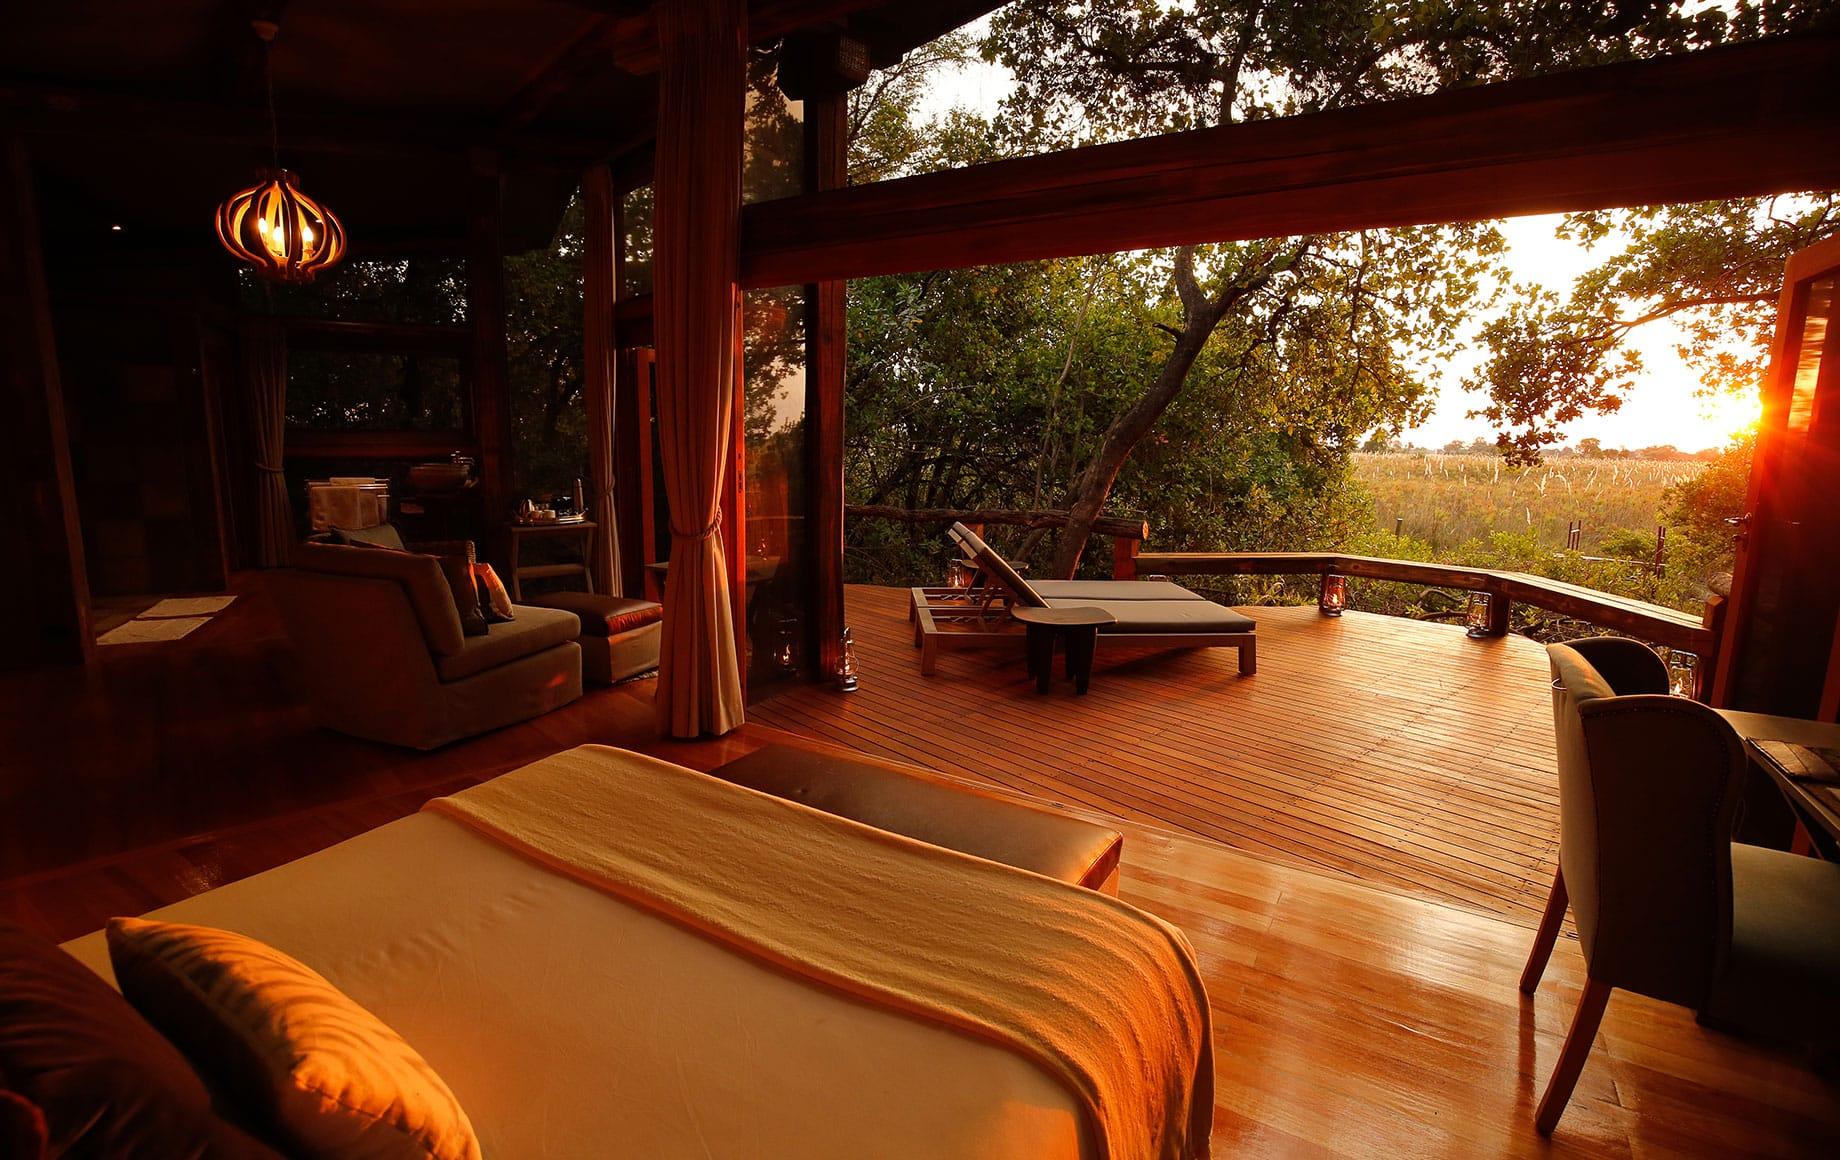 A bedroom at Camp Okavango at sunset